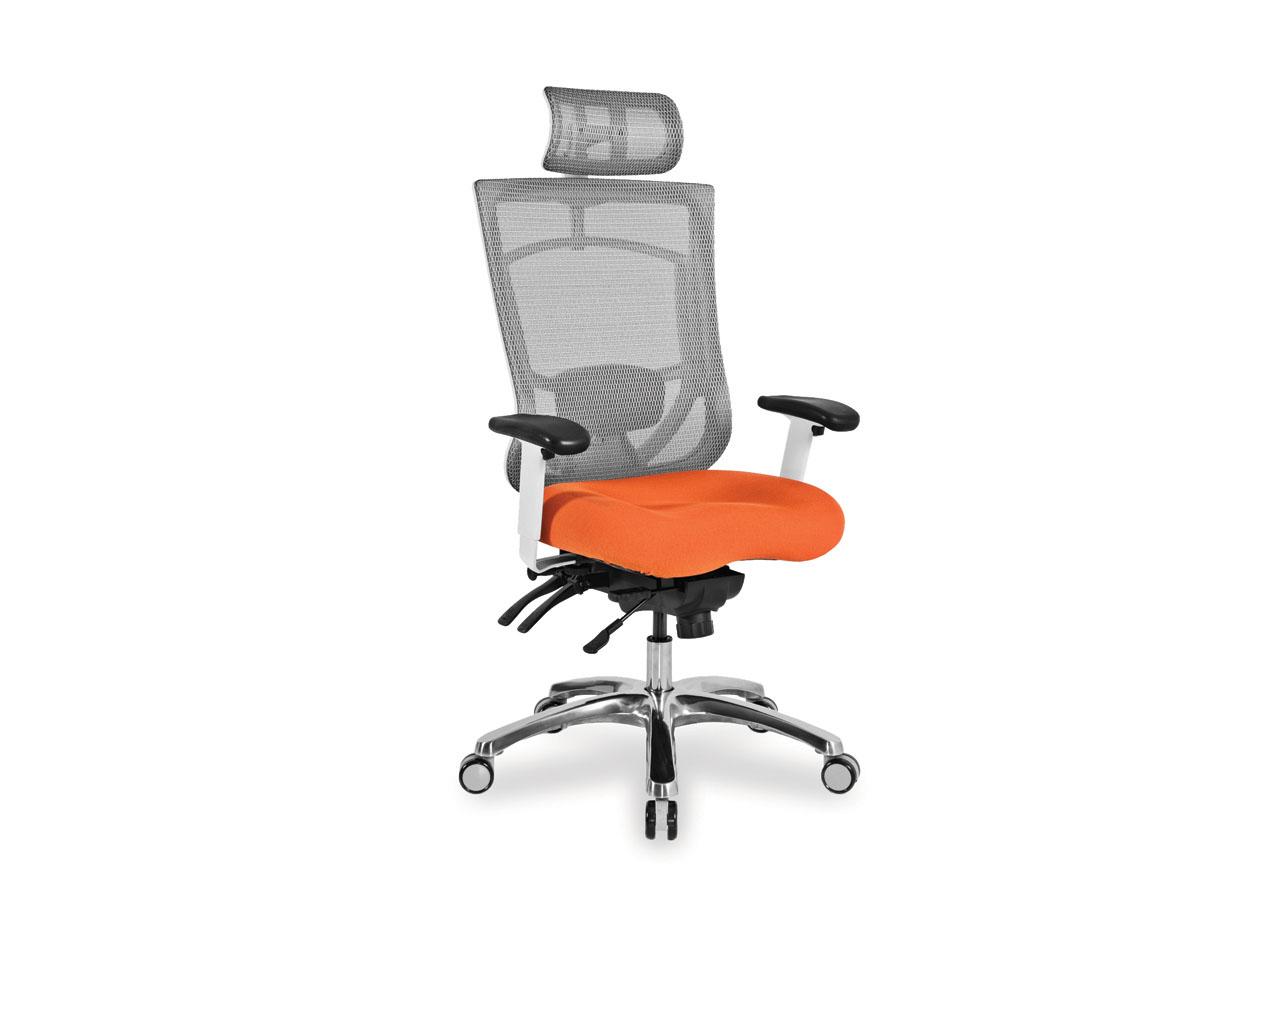 ergonomic chair pros armchair pillow coolmesh pro plus executive high back mesh office